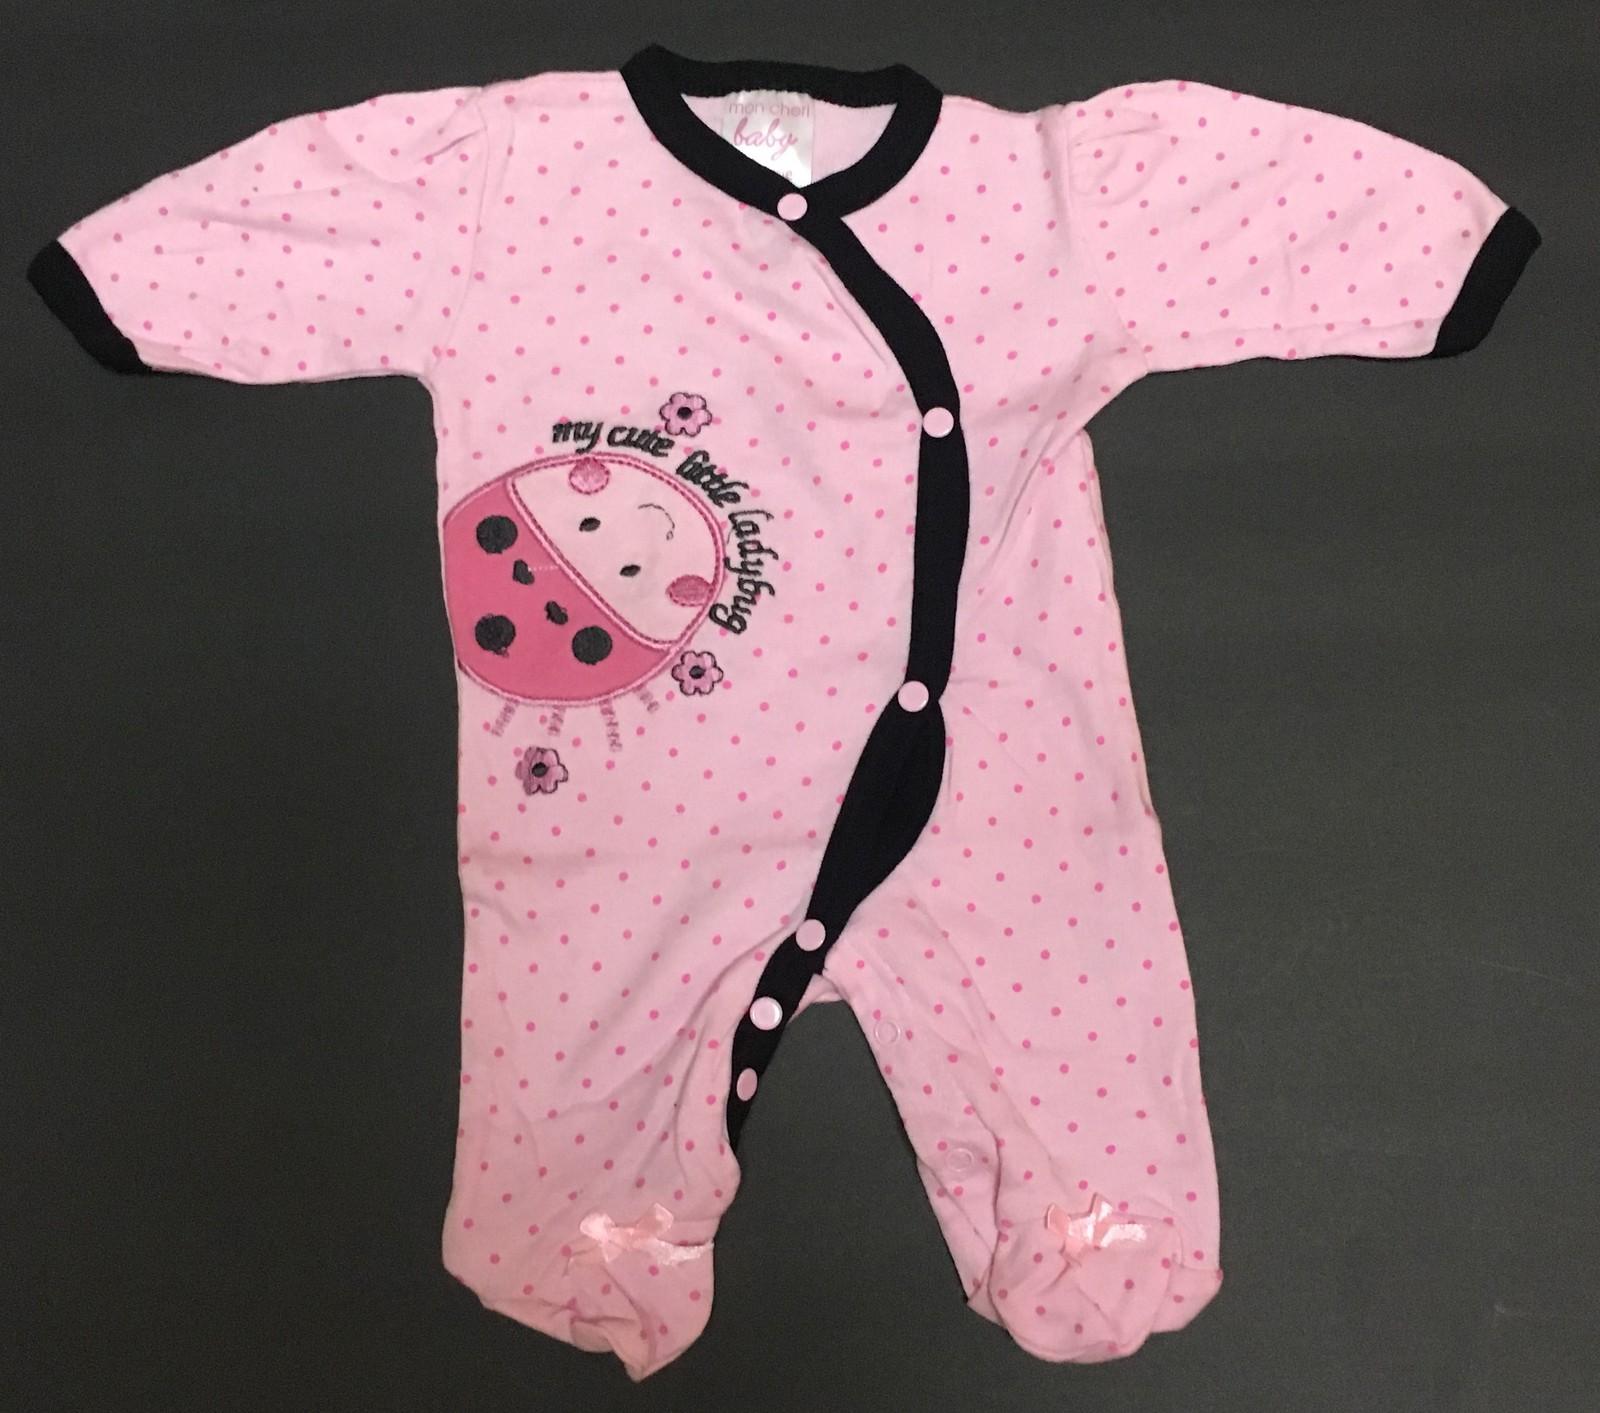 Mon Cheri Preemie One Piece My Cute Little Ladybug Pink Polka Dot